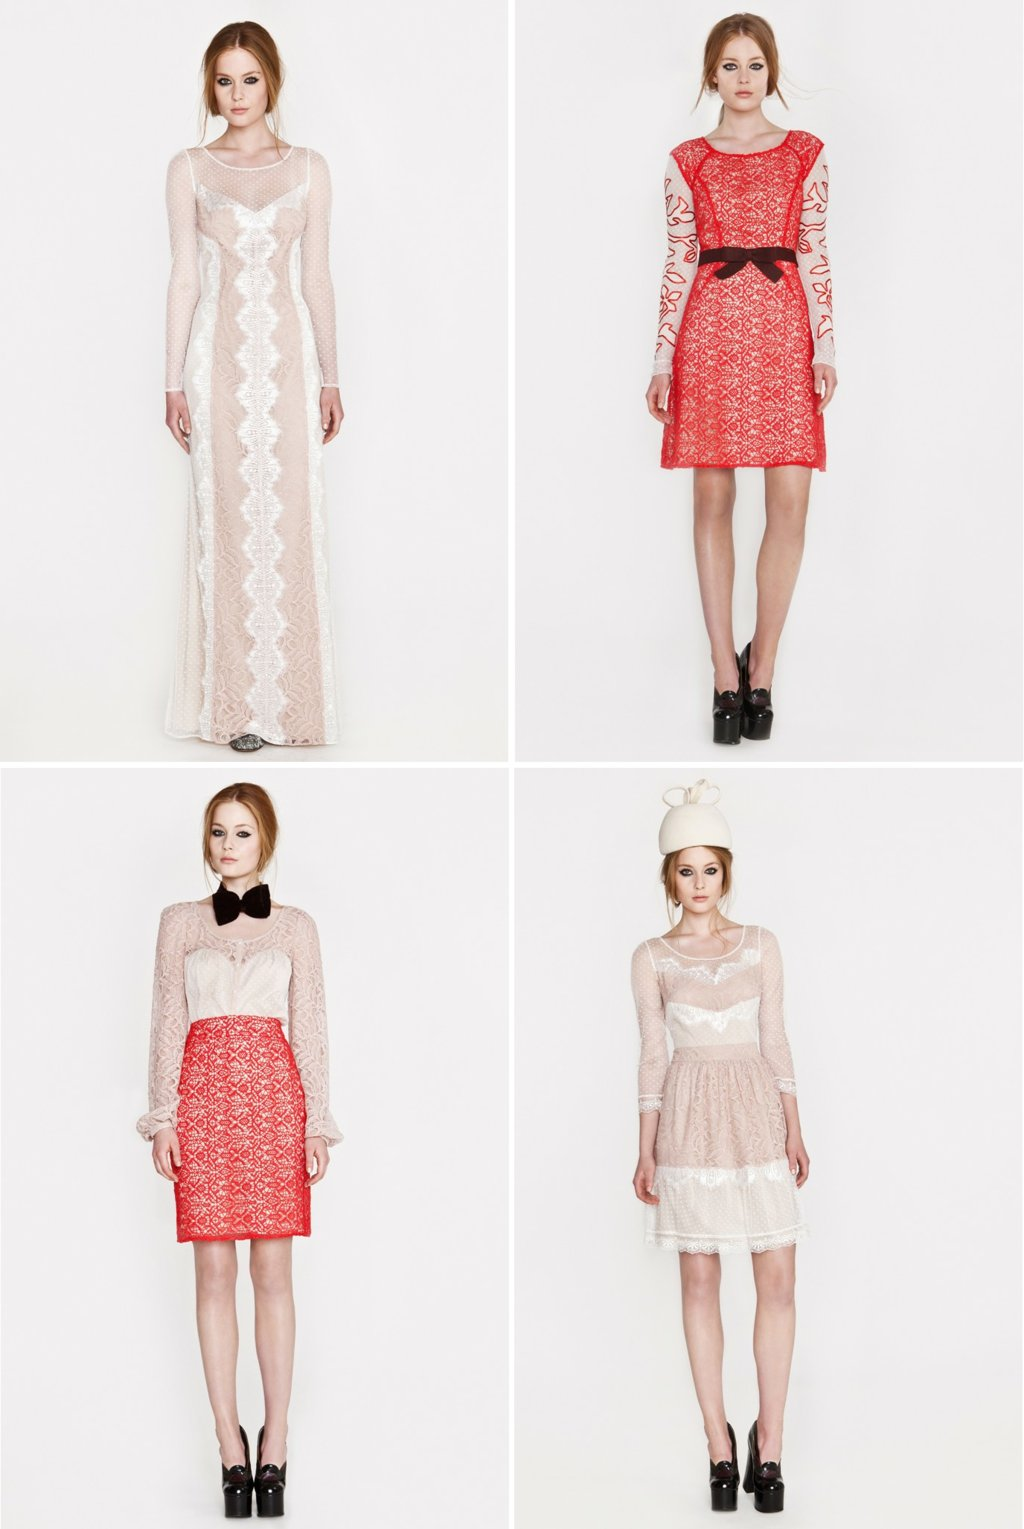 Alice-temperley-wedding-dress-inspiration-resort-2013-dresses.full